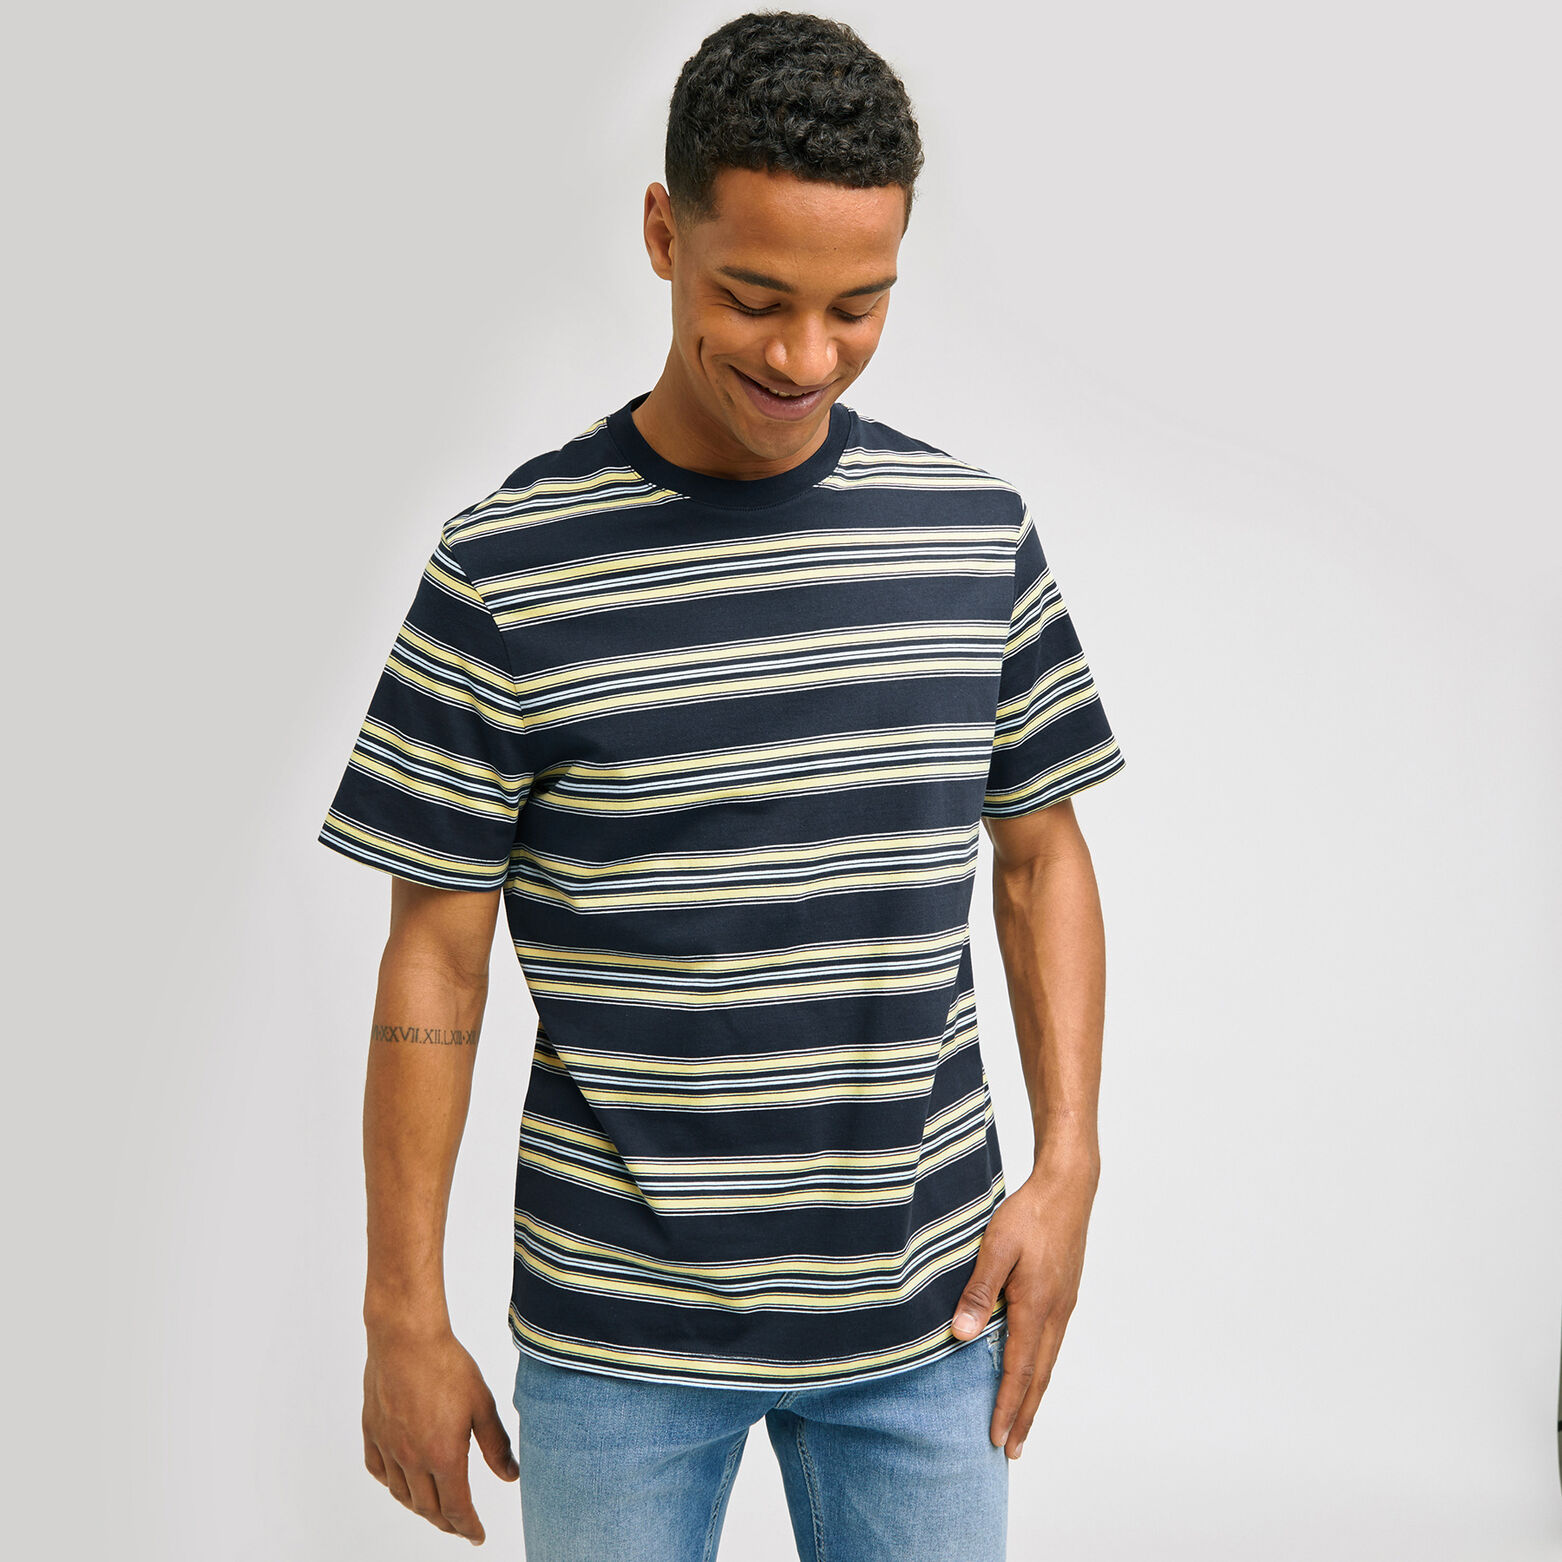 Tee-shirt rayé COOL FIT en coton issu de l'agri bi